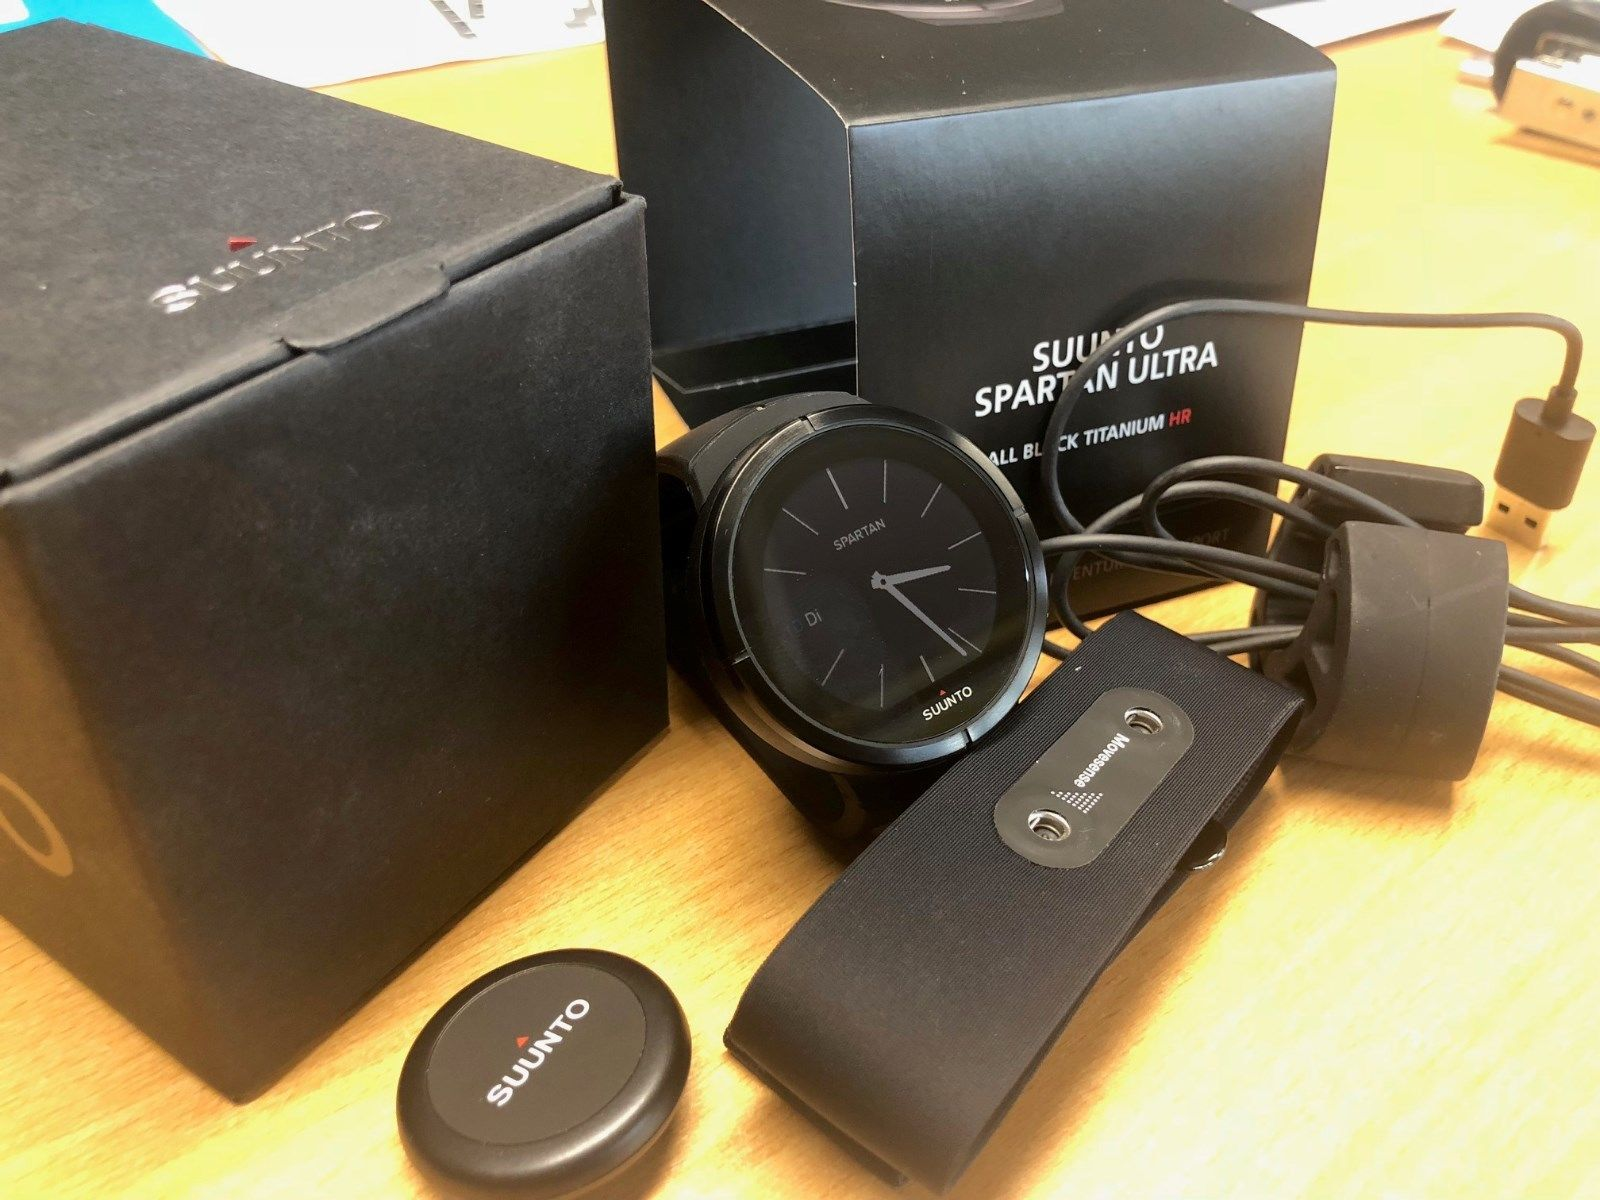 Suunto Spartan Ultra / All Black Titanium HR